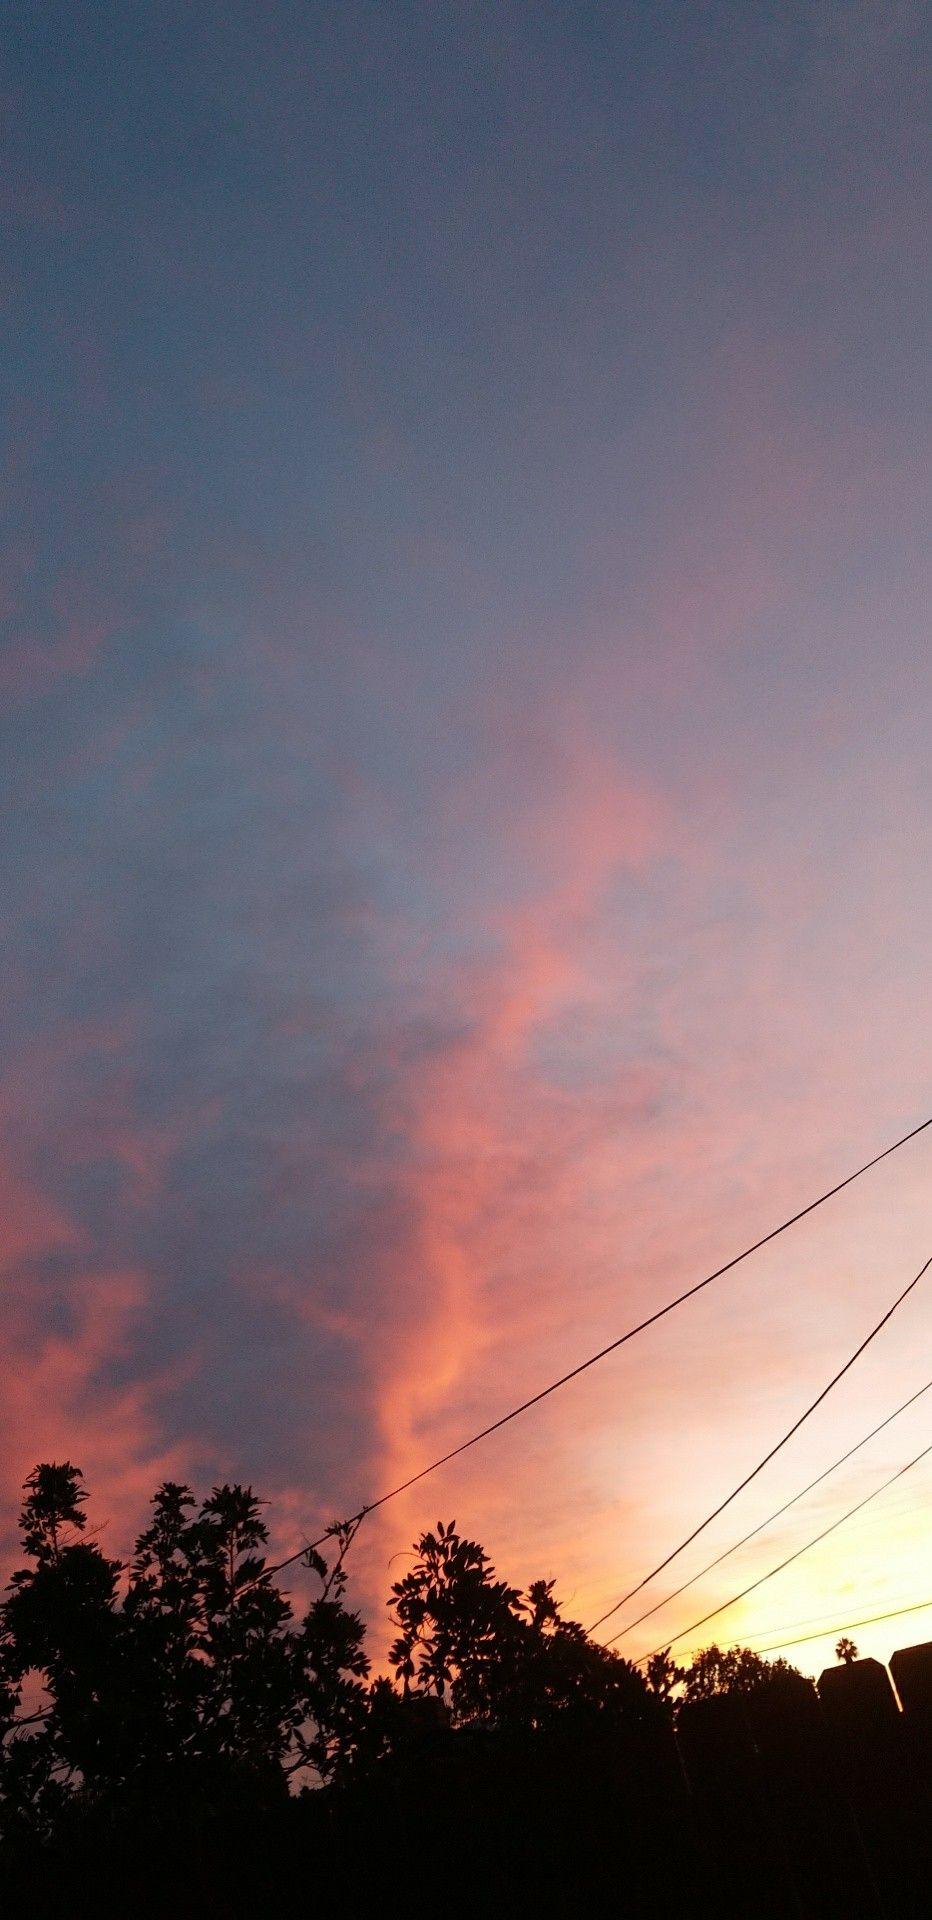 I Just Took This Right Now What A Beautiful Sunrise Latar Belakang Pemandangan Langit